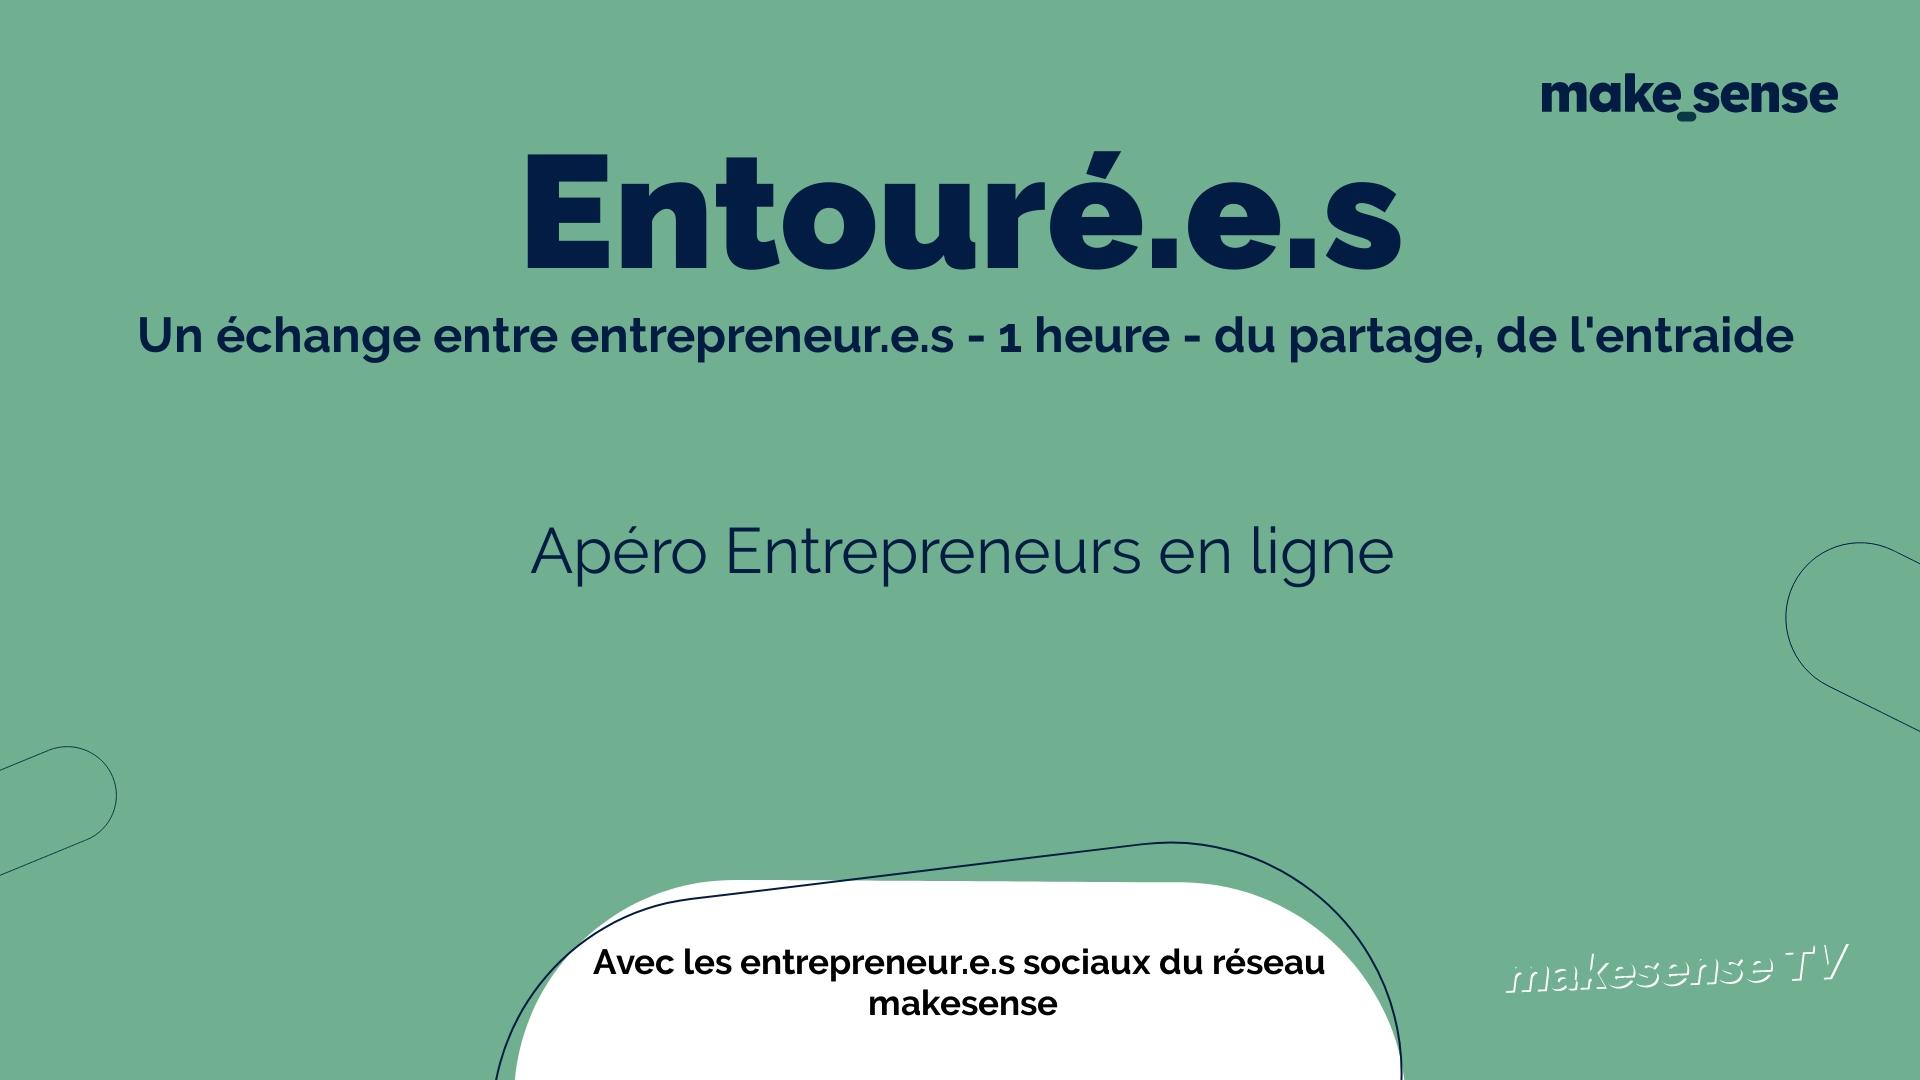 Apéro Entrepreneurs en ligne